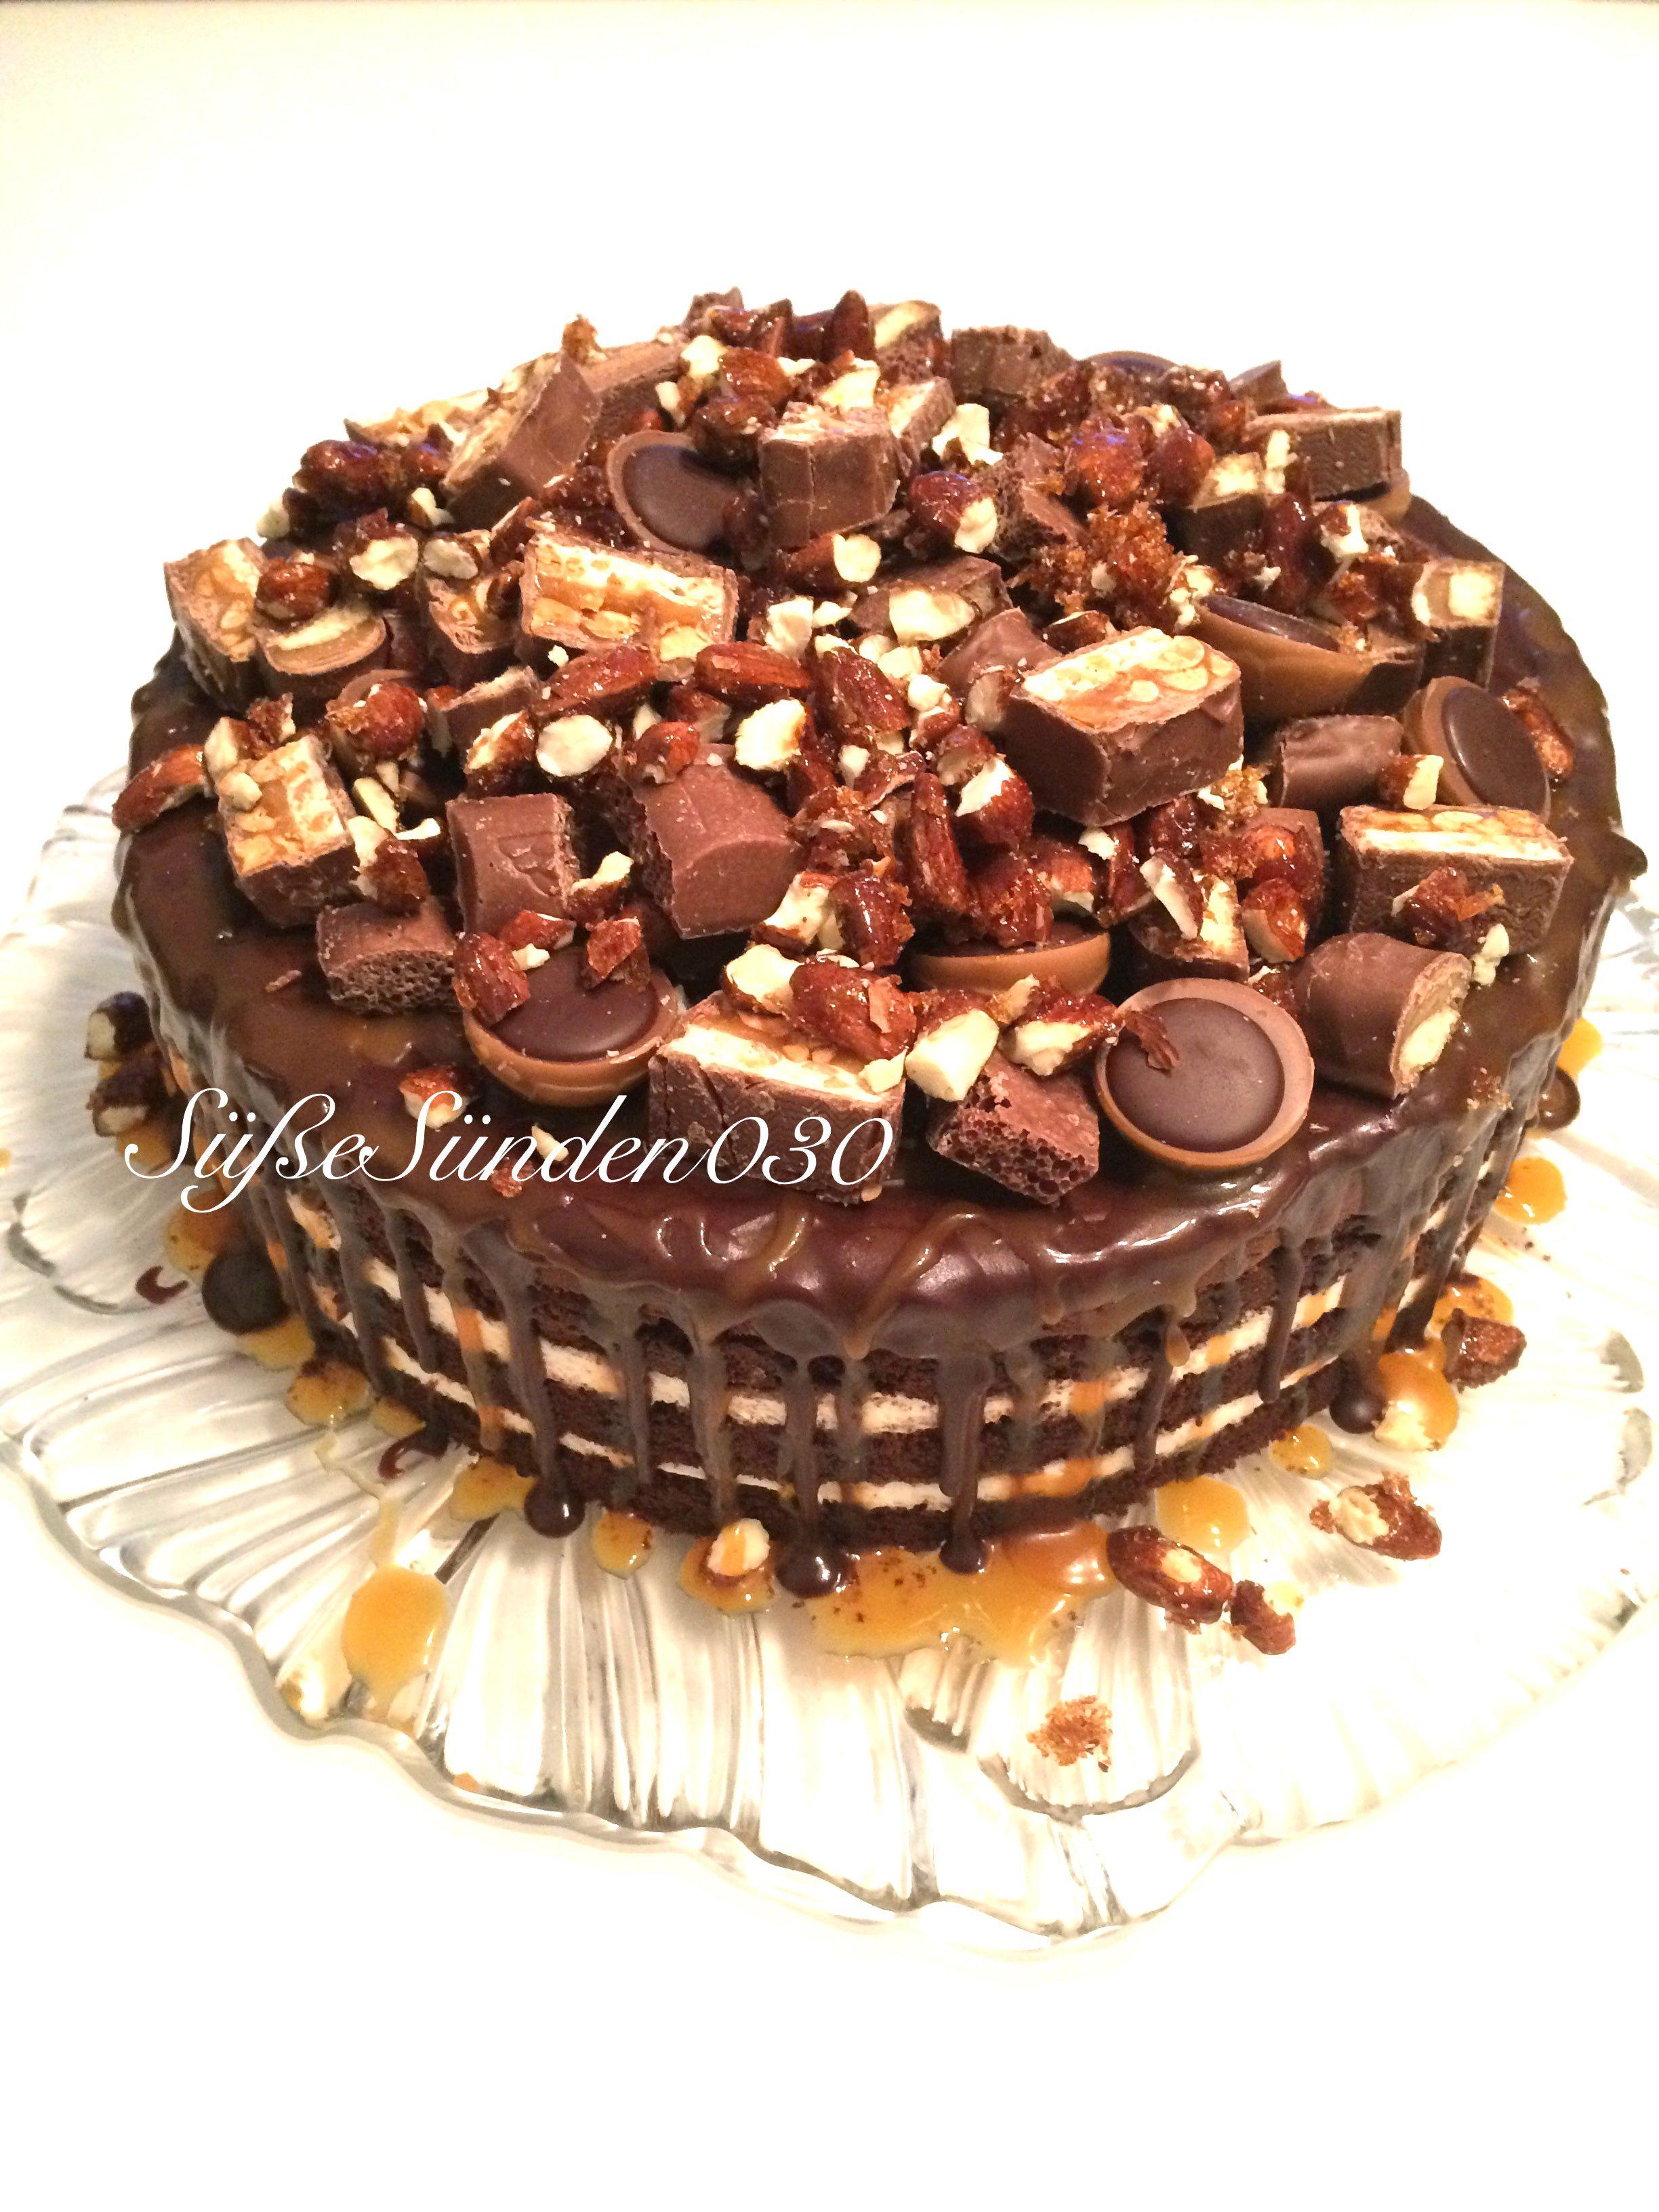 Schokoladentorte mit Karamell schokoladig lecker süße Sünden